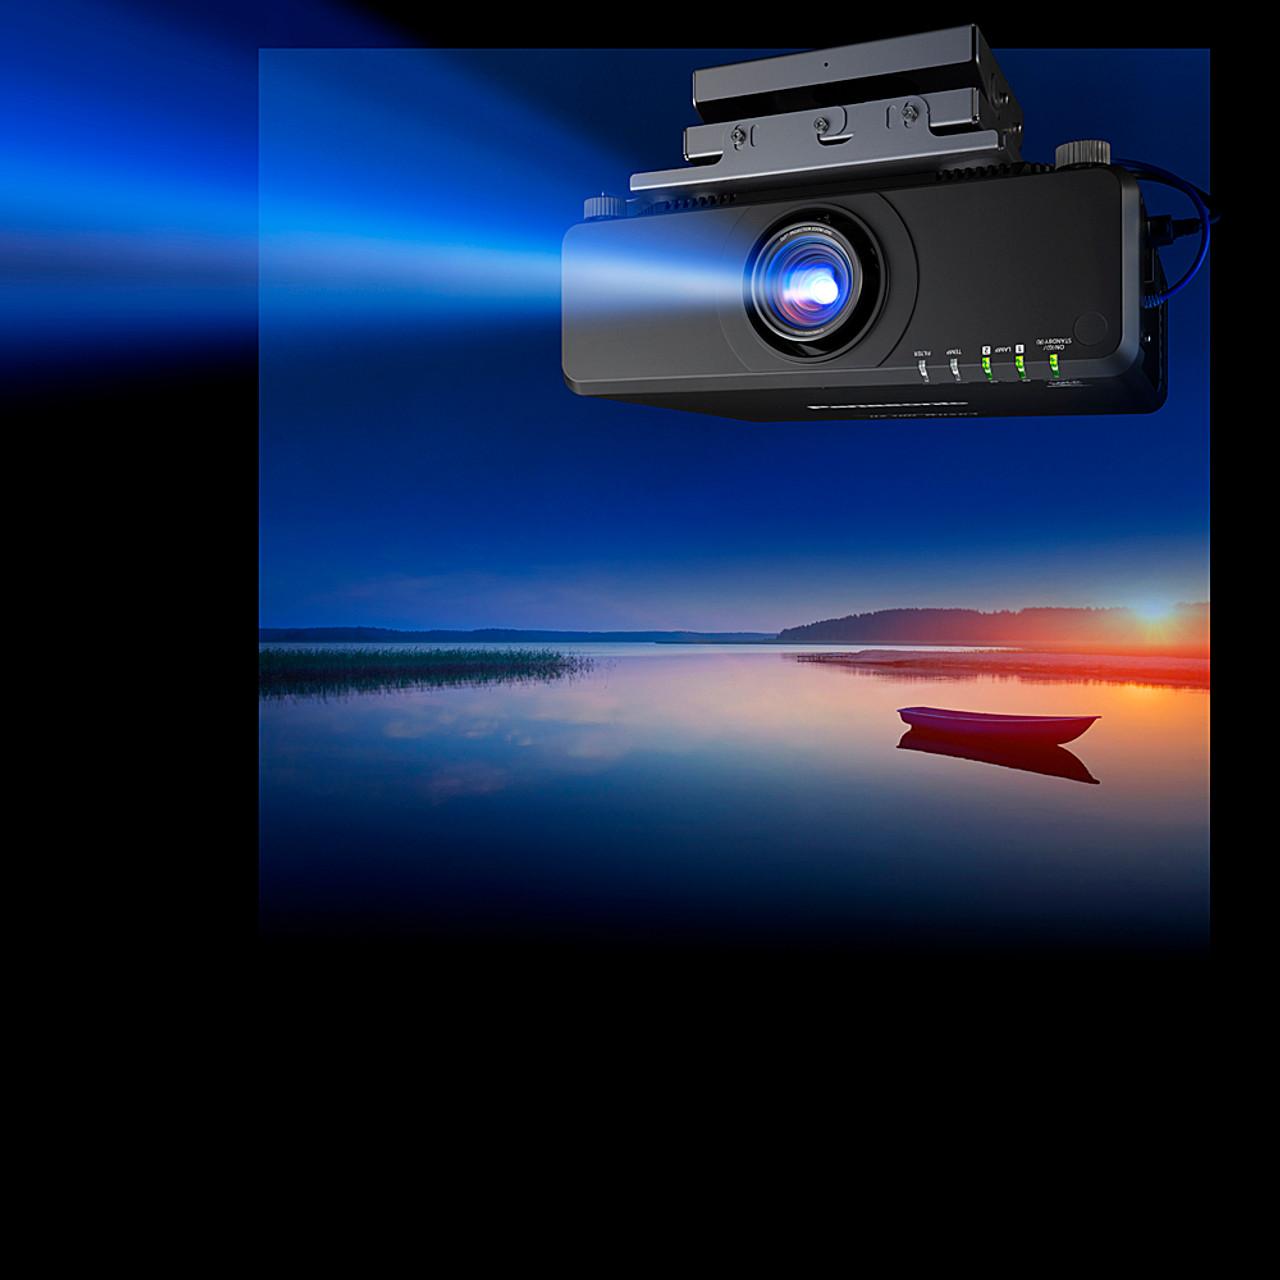 Panasonic Pt Dx820be Xga 8200 Lumen High Brightness Lcd